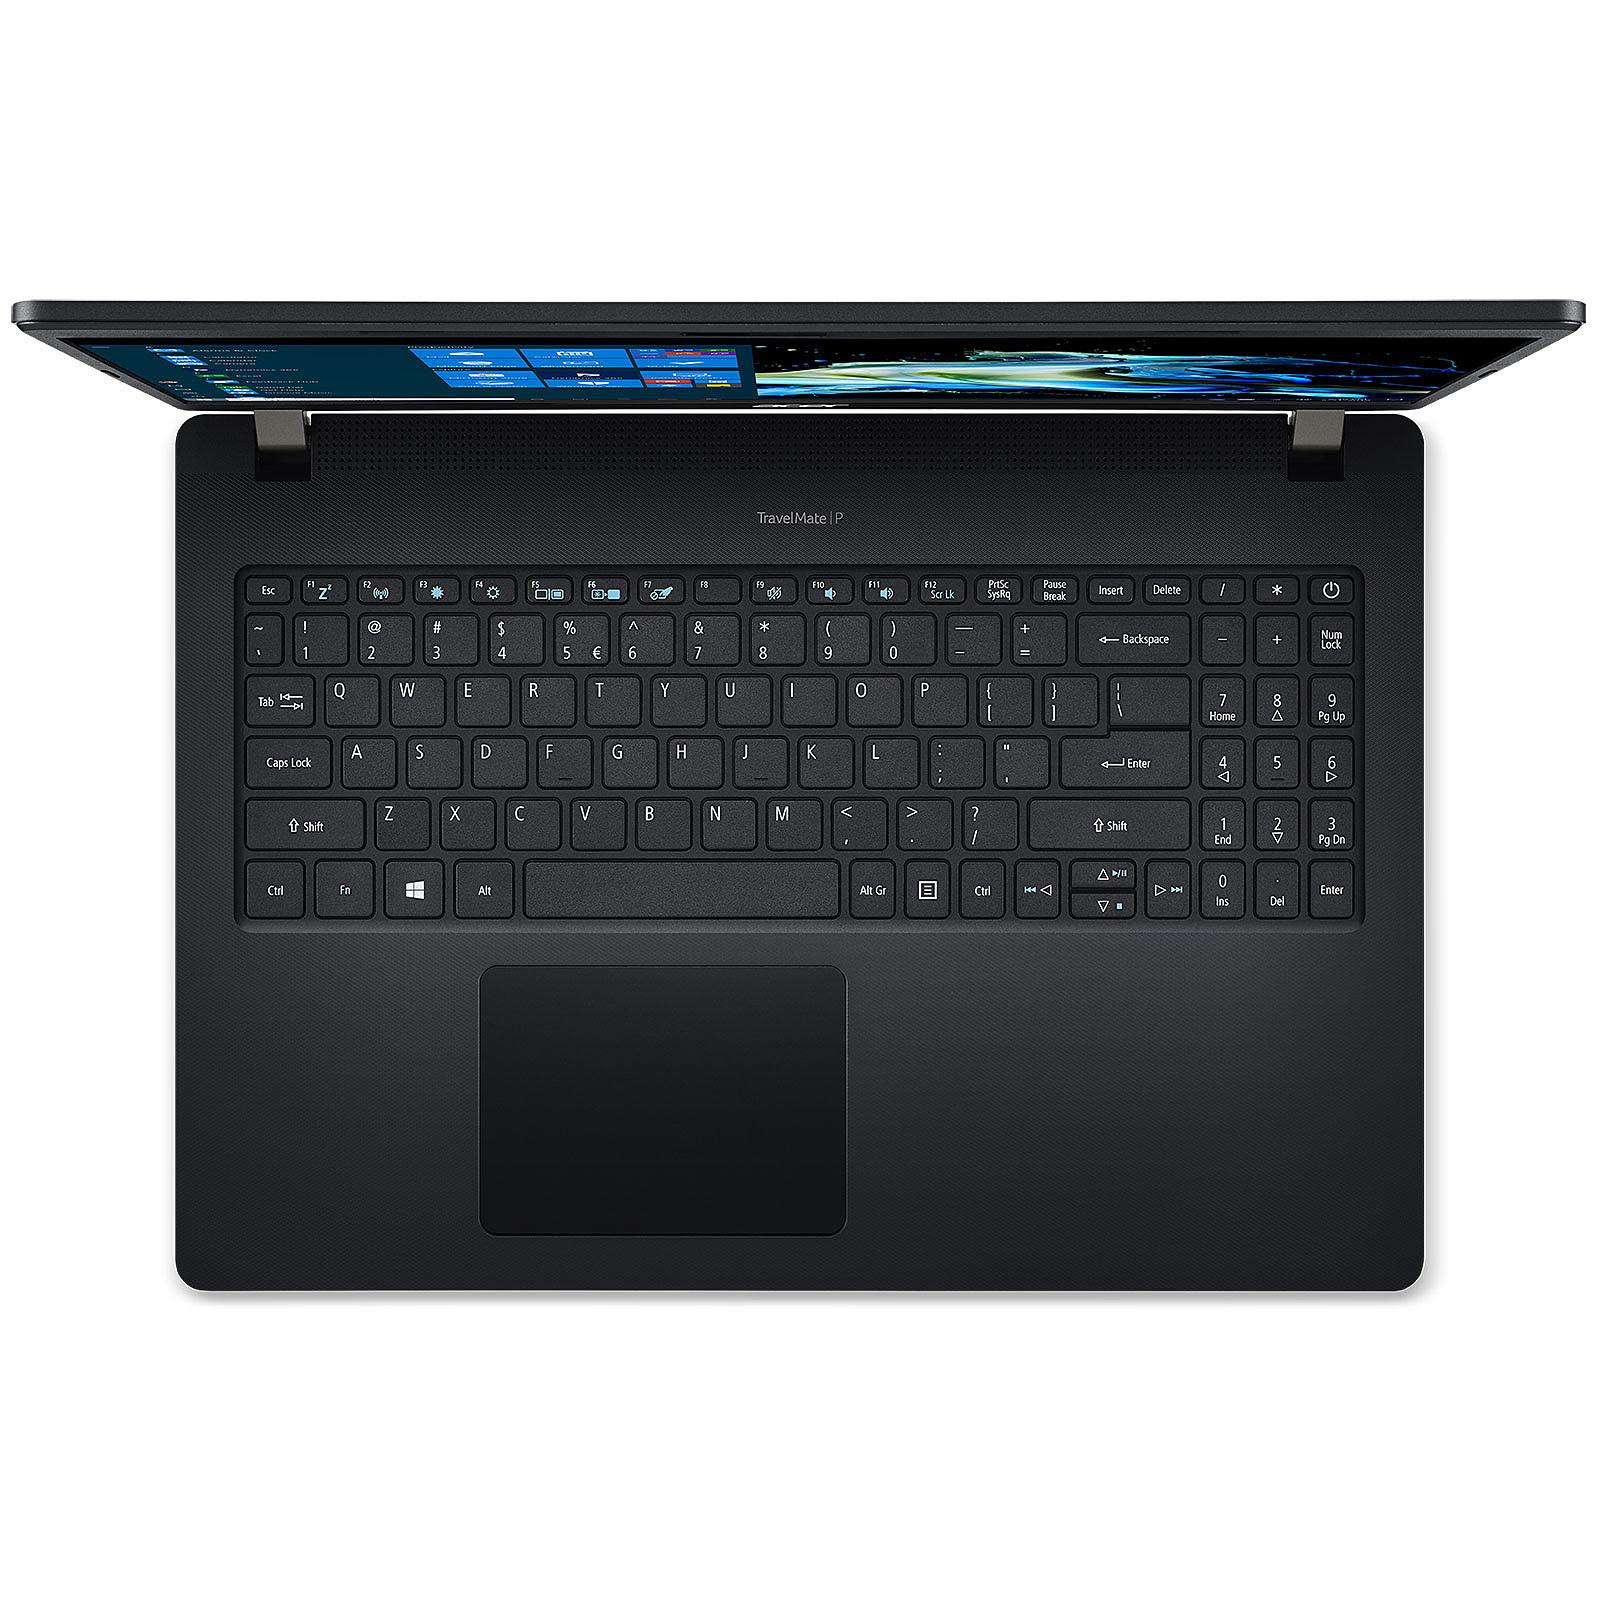 Acer NX.VLLEF.003 - PC portable Acer - Cybertek.fr - 2